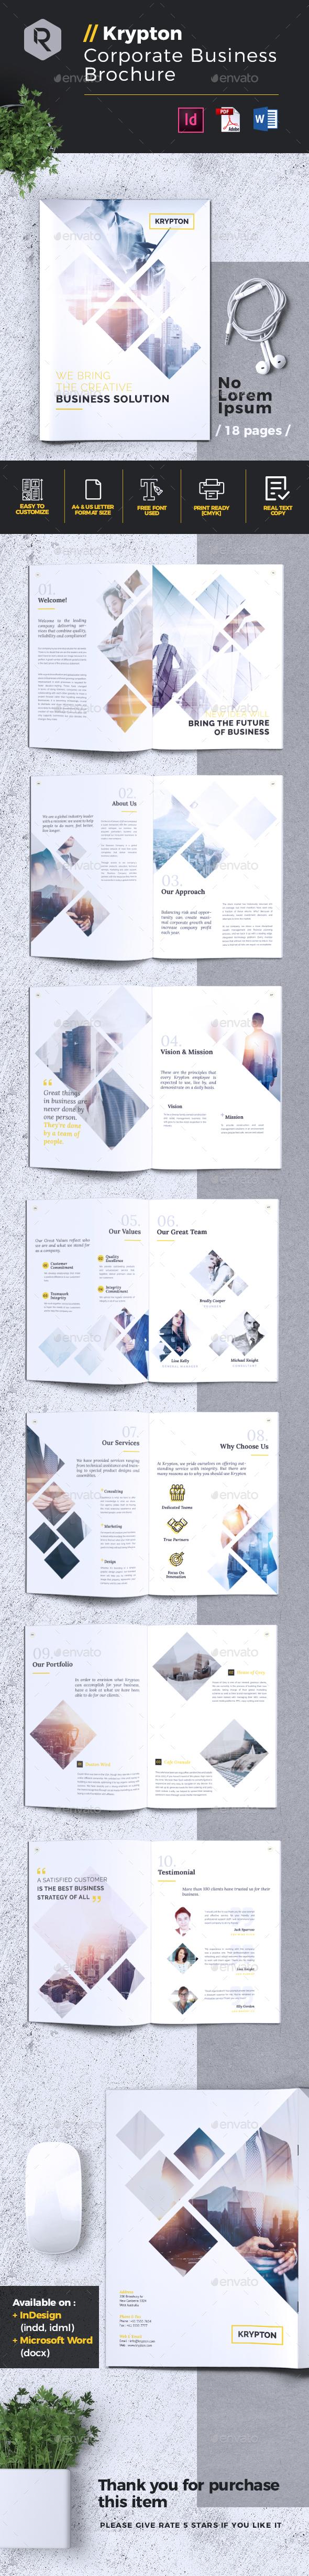 Krypton | Corporate Business Brochure - Corporate Brochures